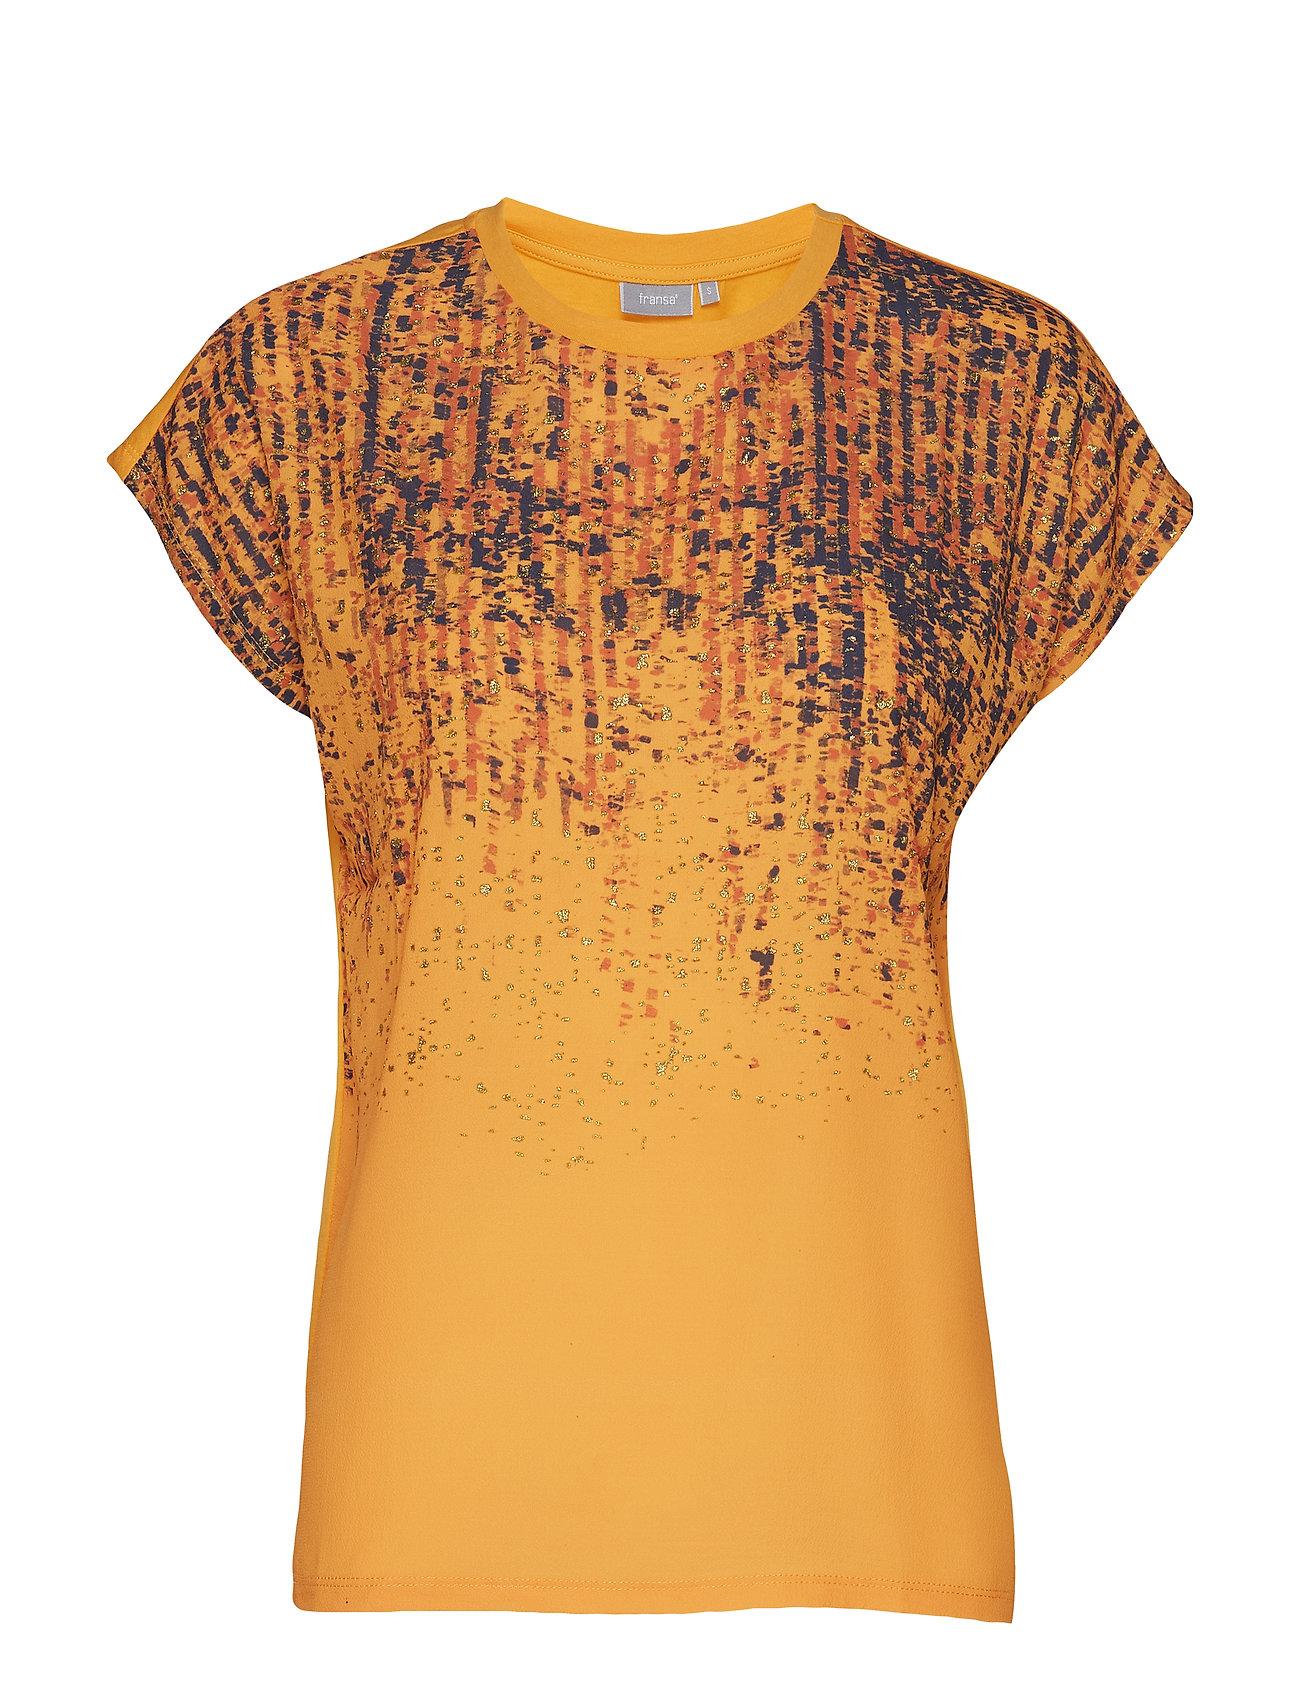 shirtgraphicAutumn T Blaze 1 Fremcaos MixFransa 34jR5AL